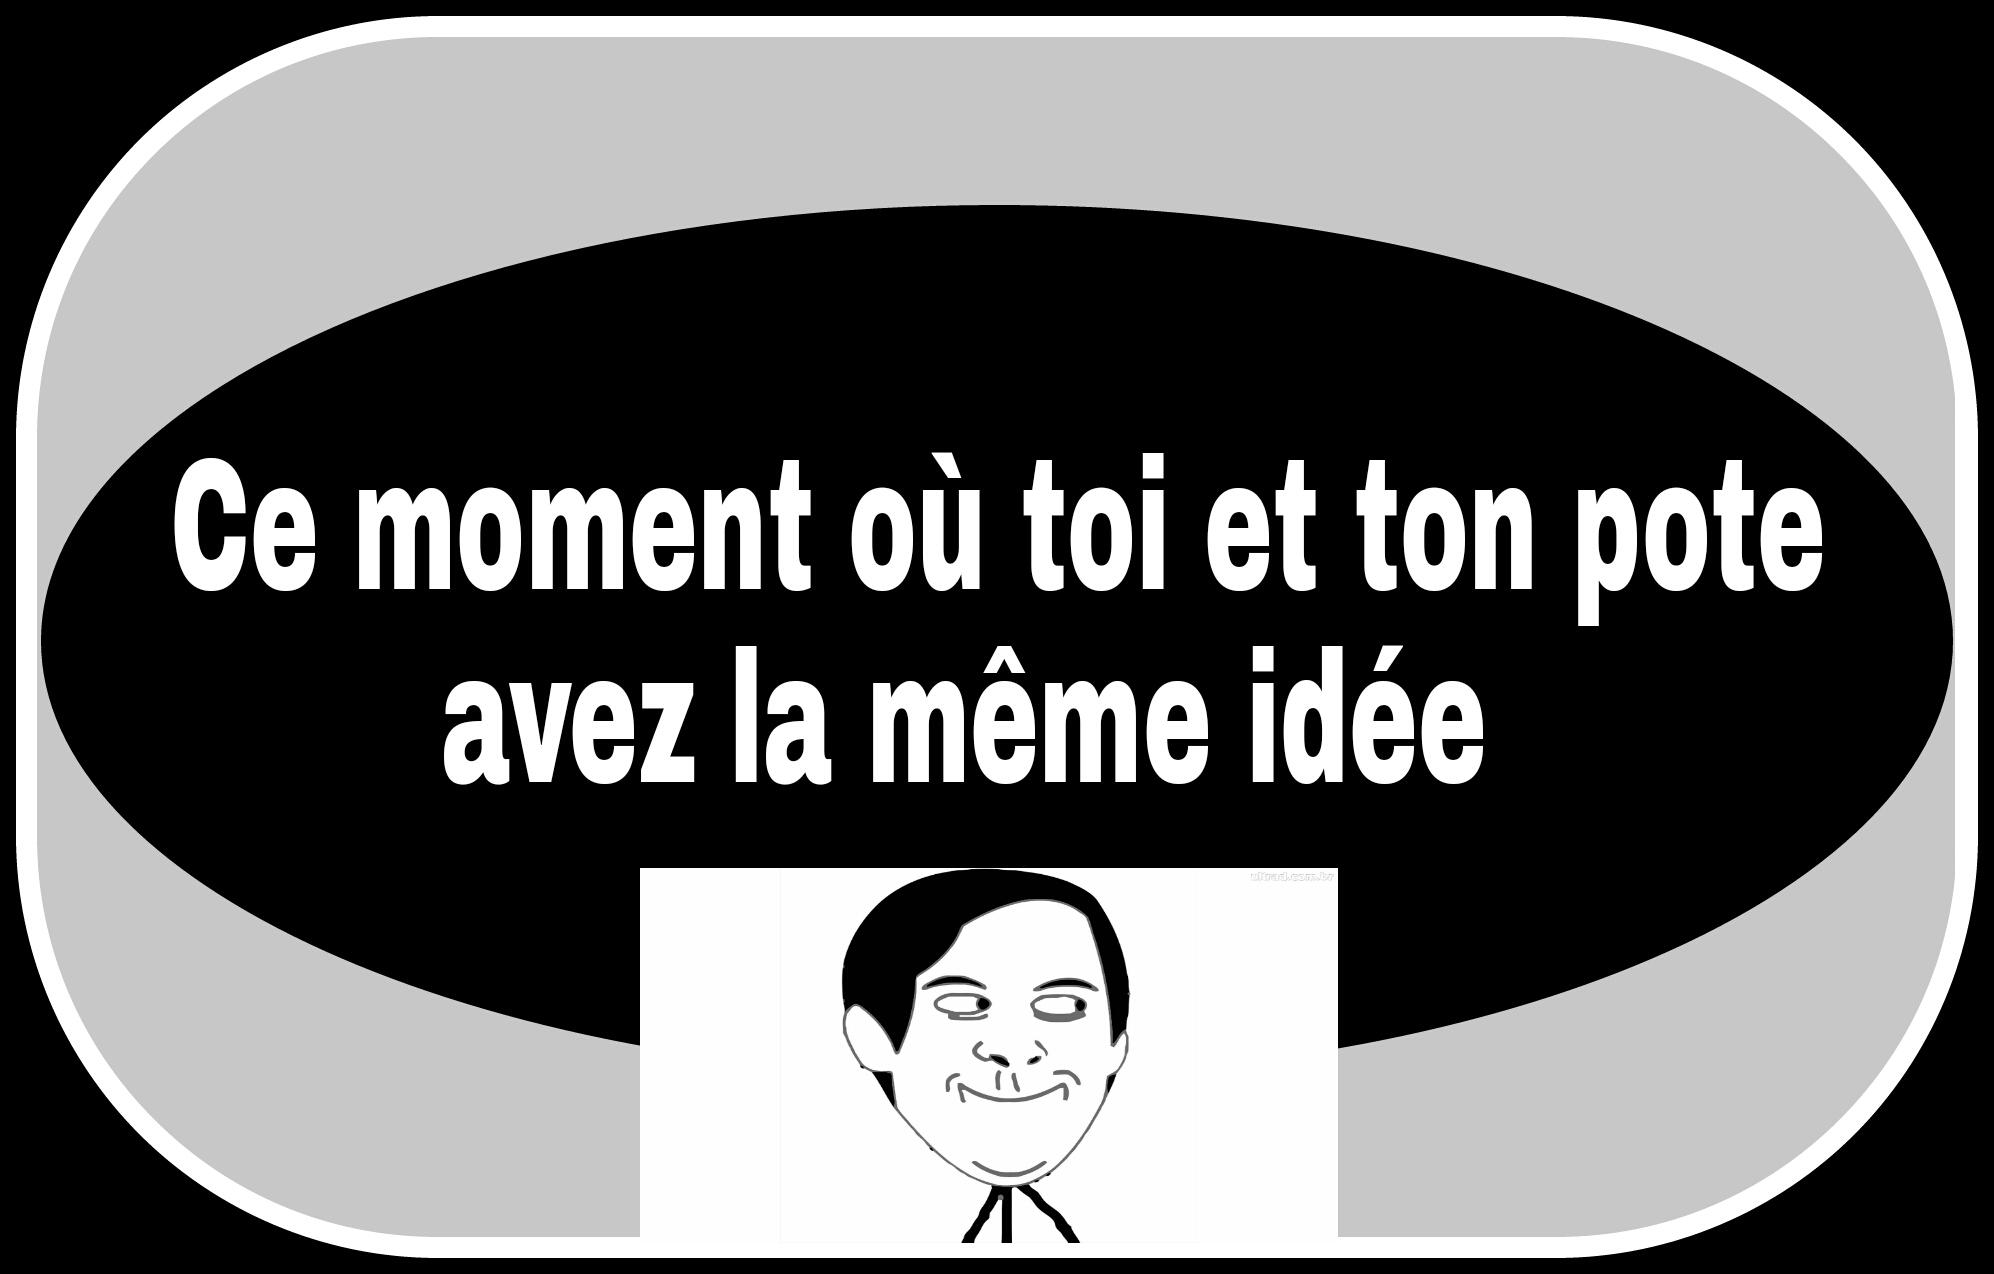 Ce moment x) - meme